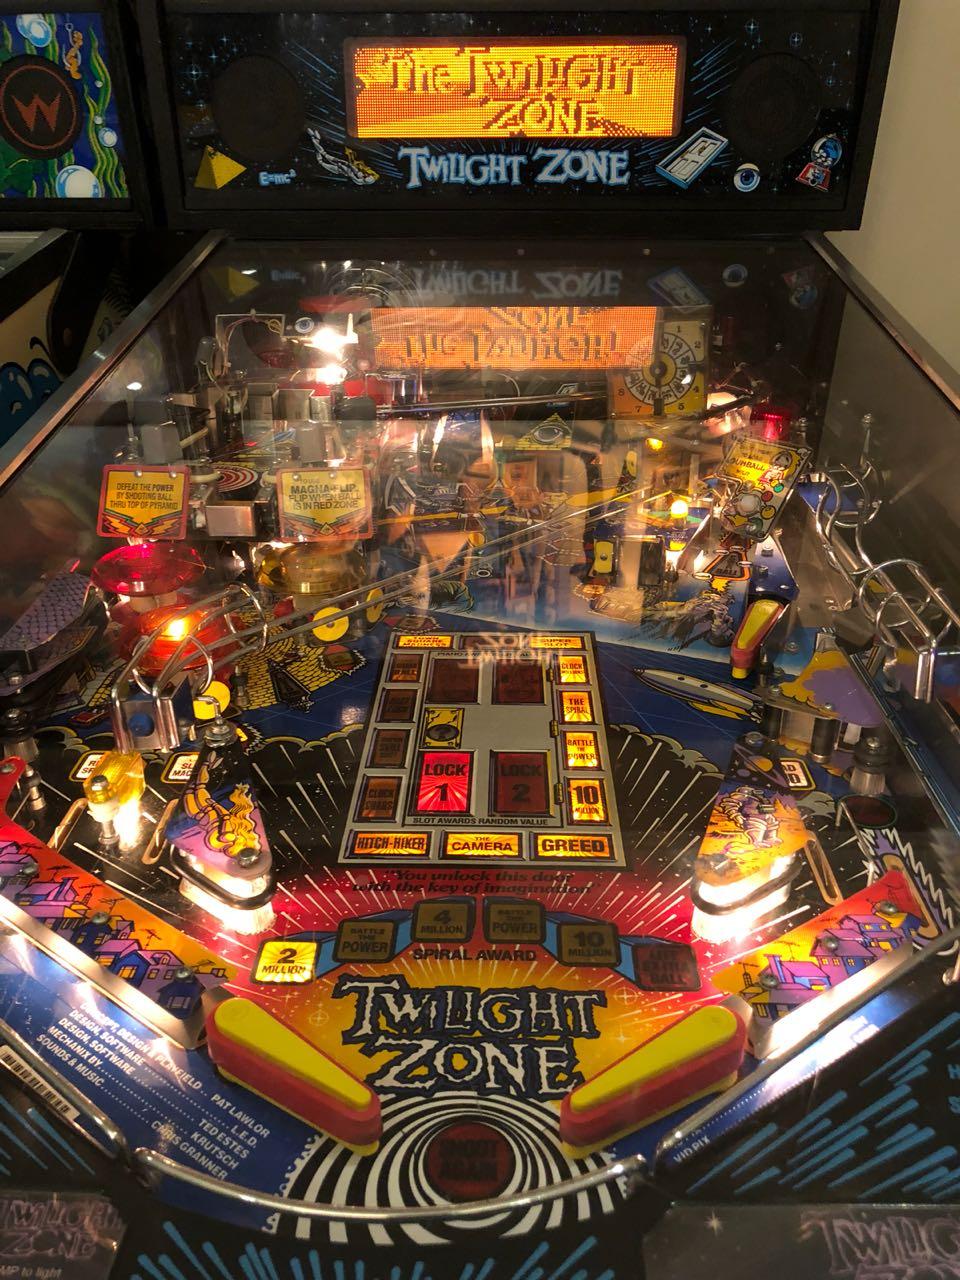 Twilight Zone Pinball Machine by Bally , a Pat Lawlor